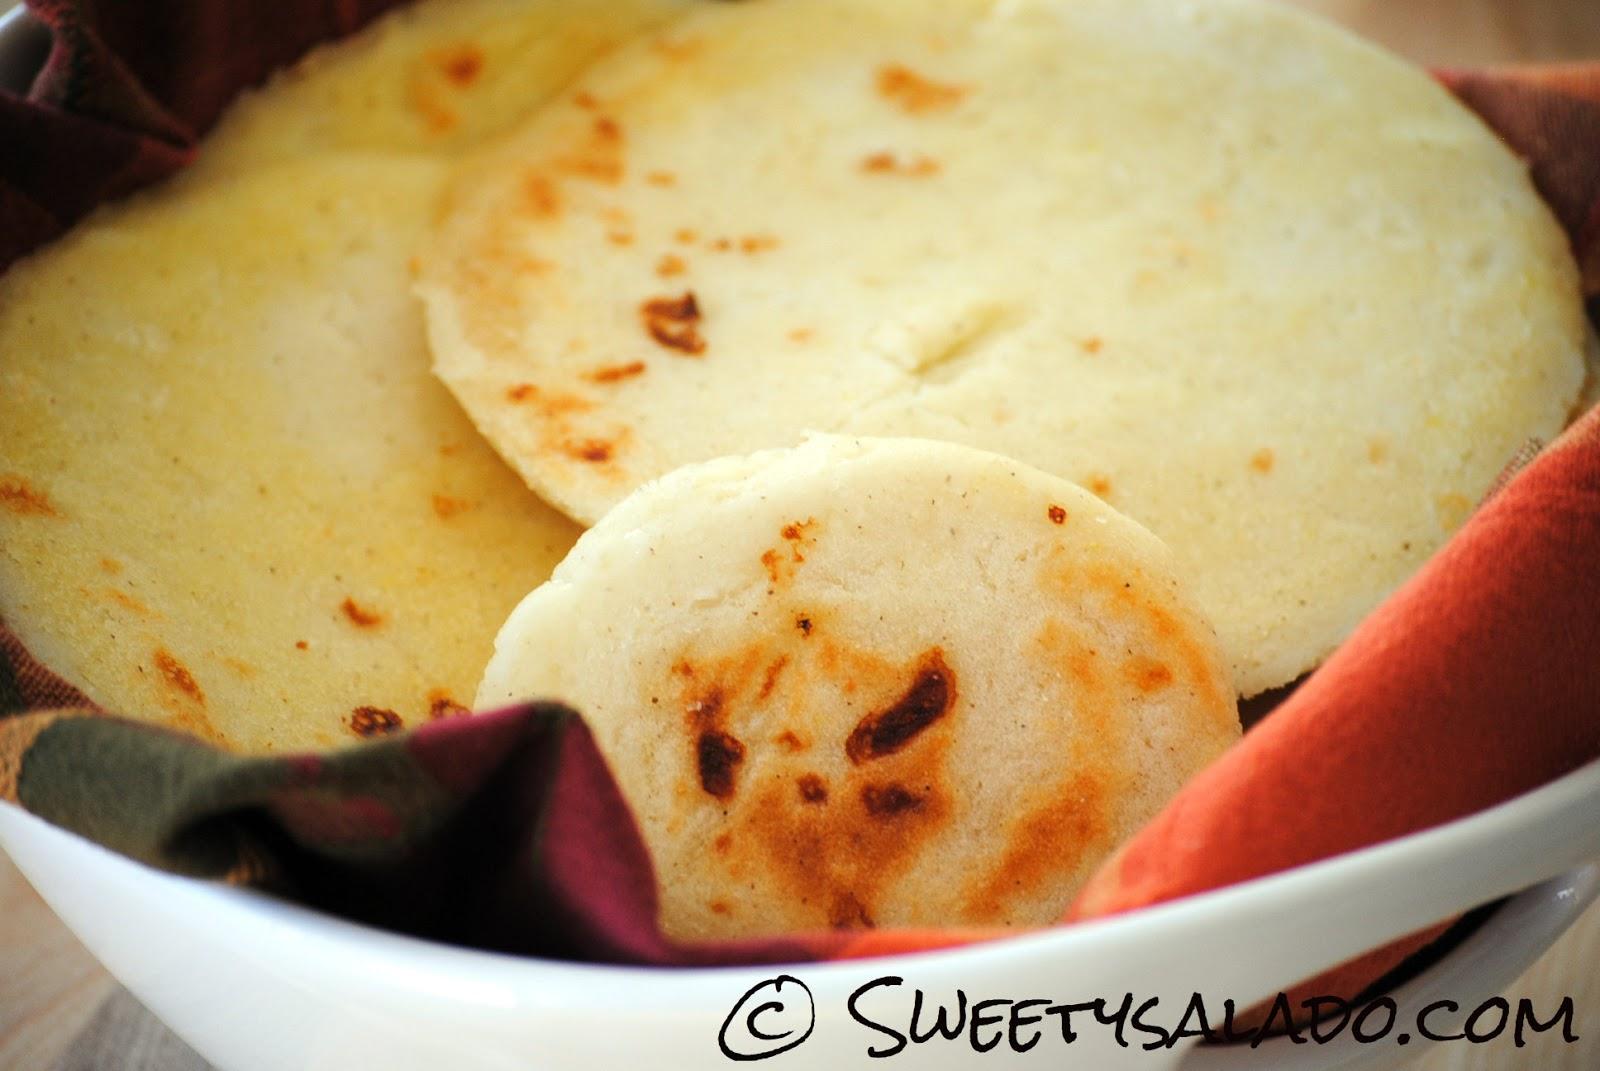 Sweet y Salado: Colombian Arepas